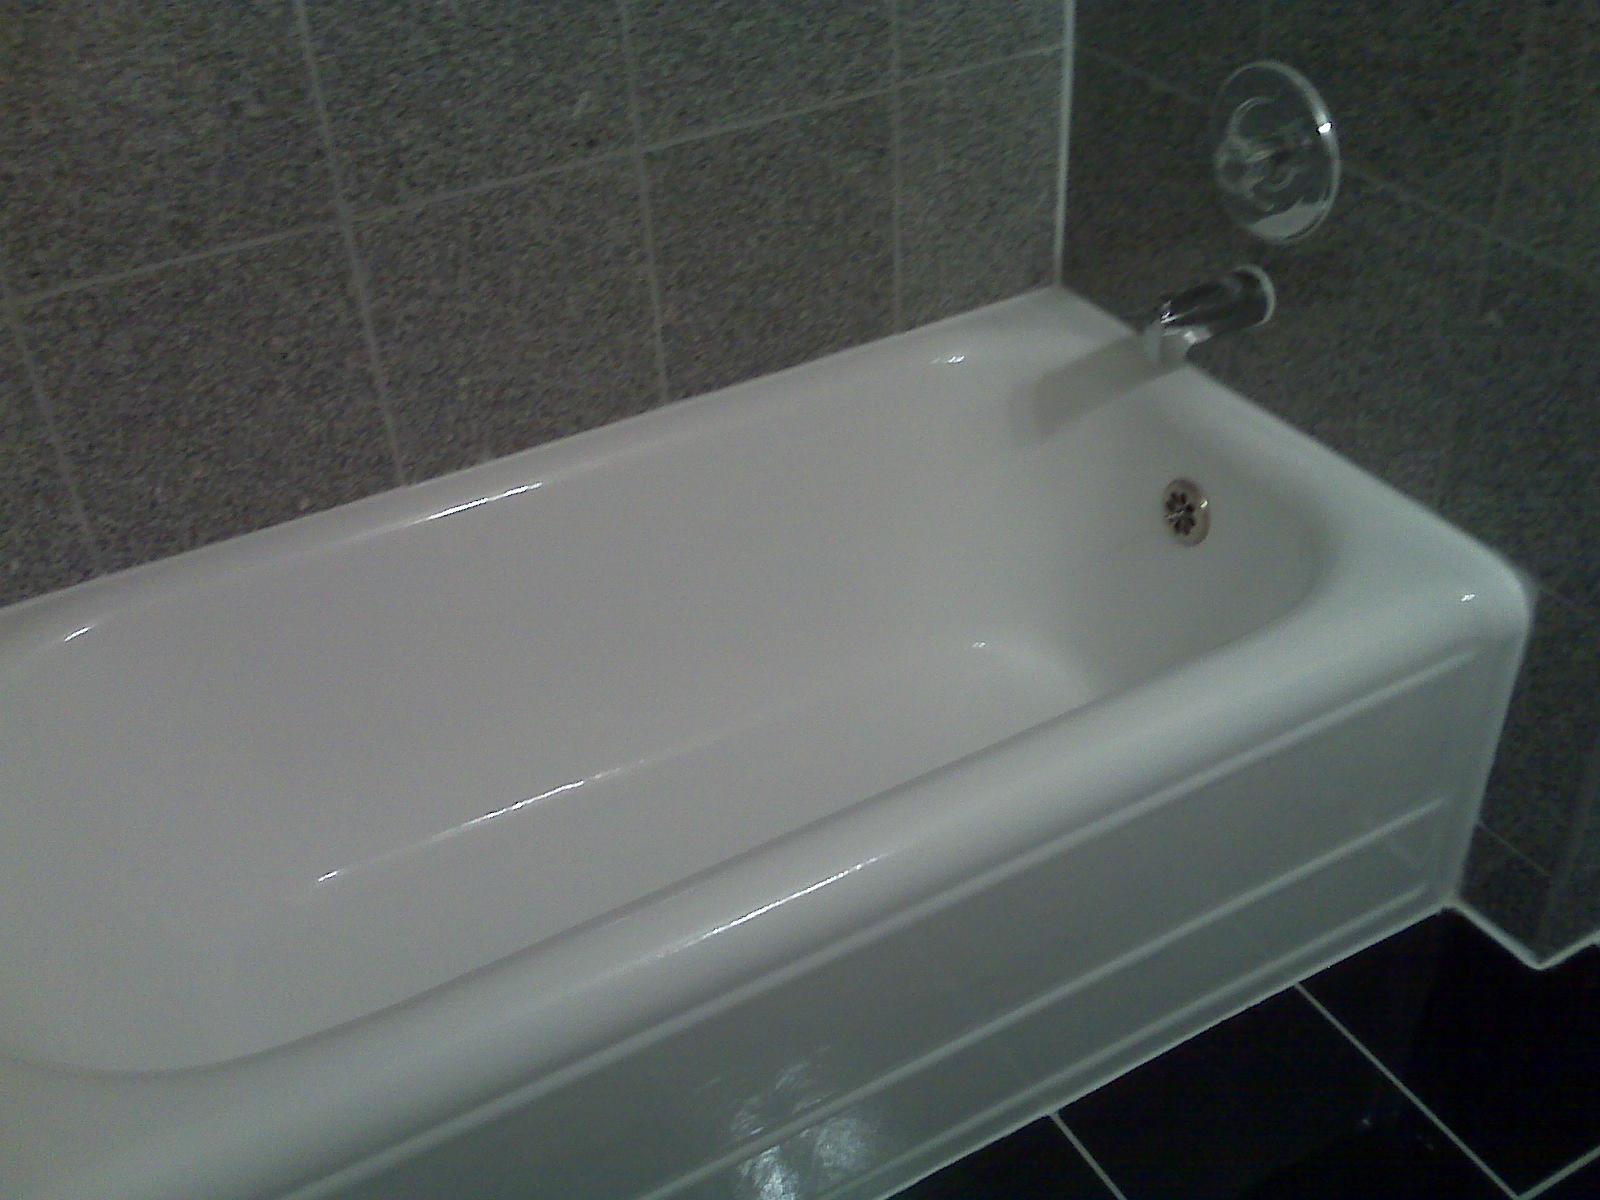 Bathtub Refinisher Miami, FL - America Bathtub and Tile Refinishing